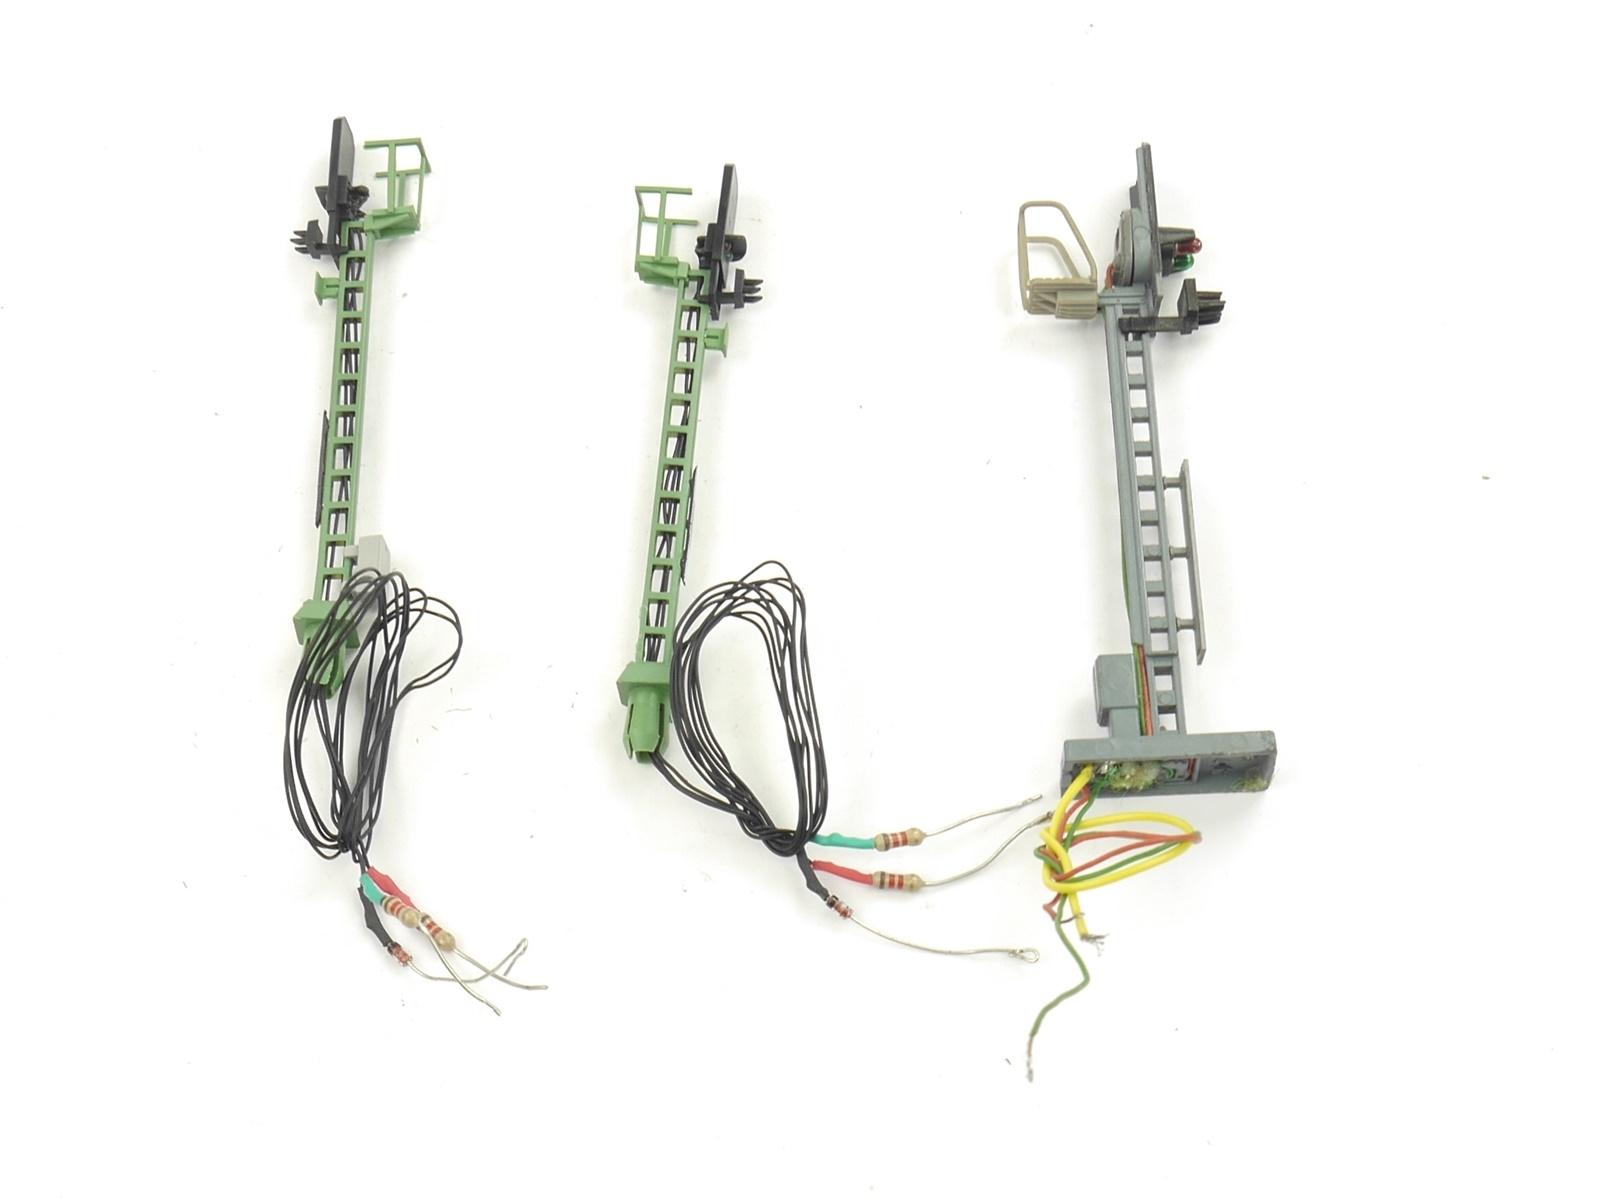 E134 Viessmann Trix H0 11/1406 3x Signal Licht-Blocksignal